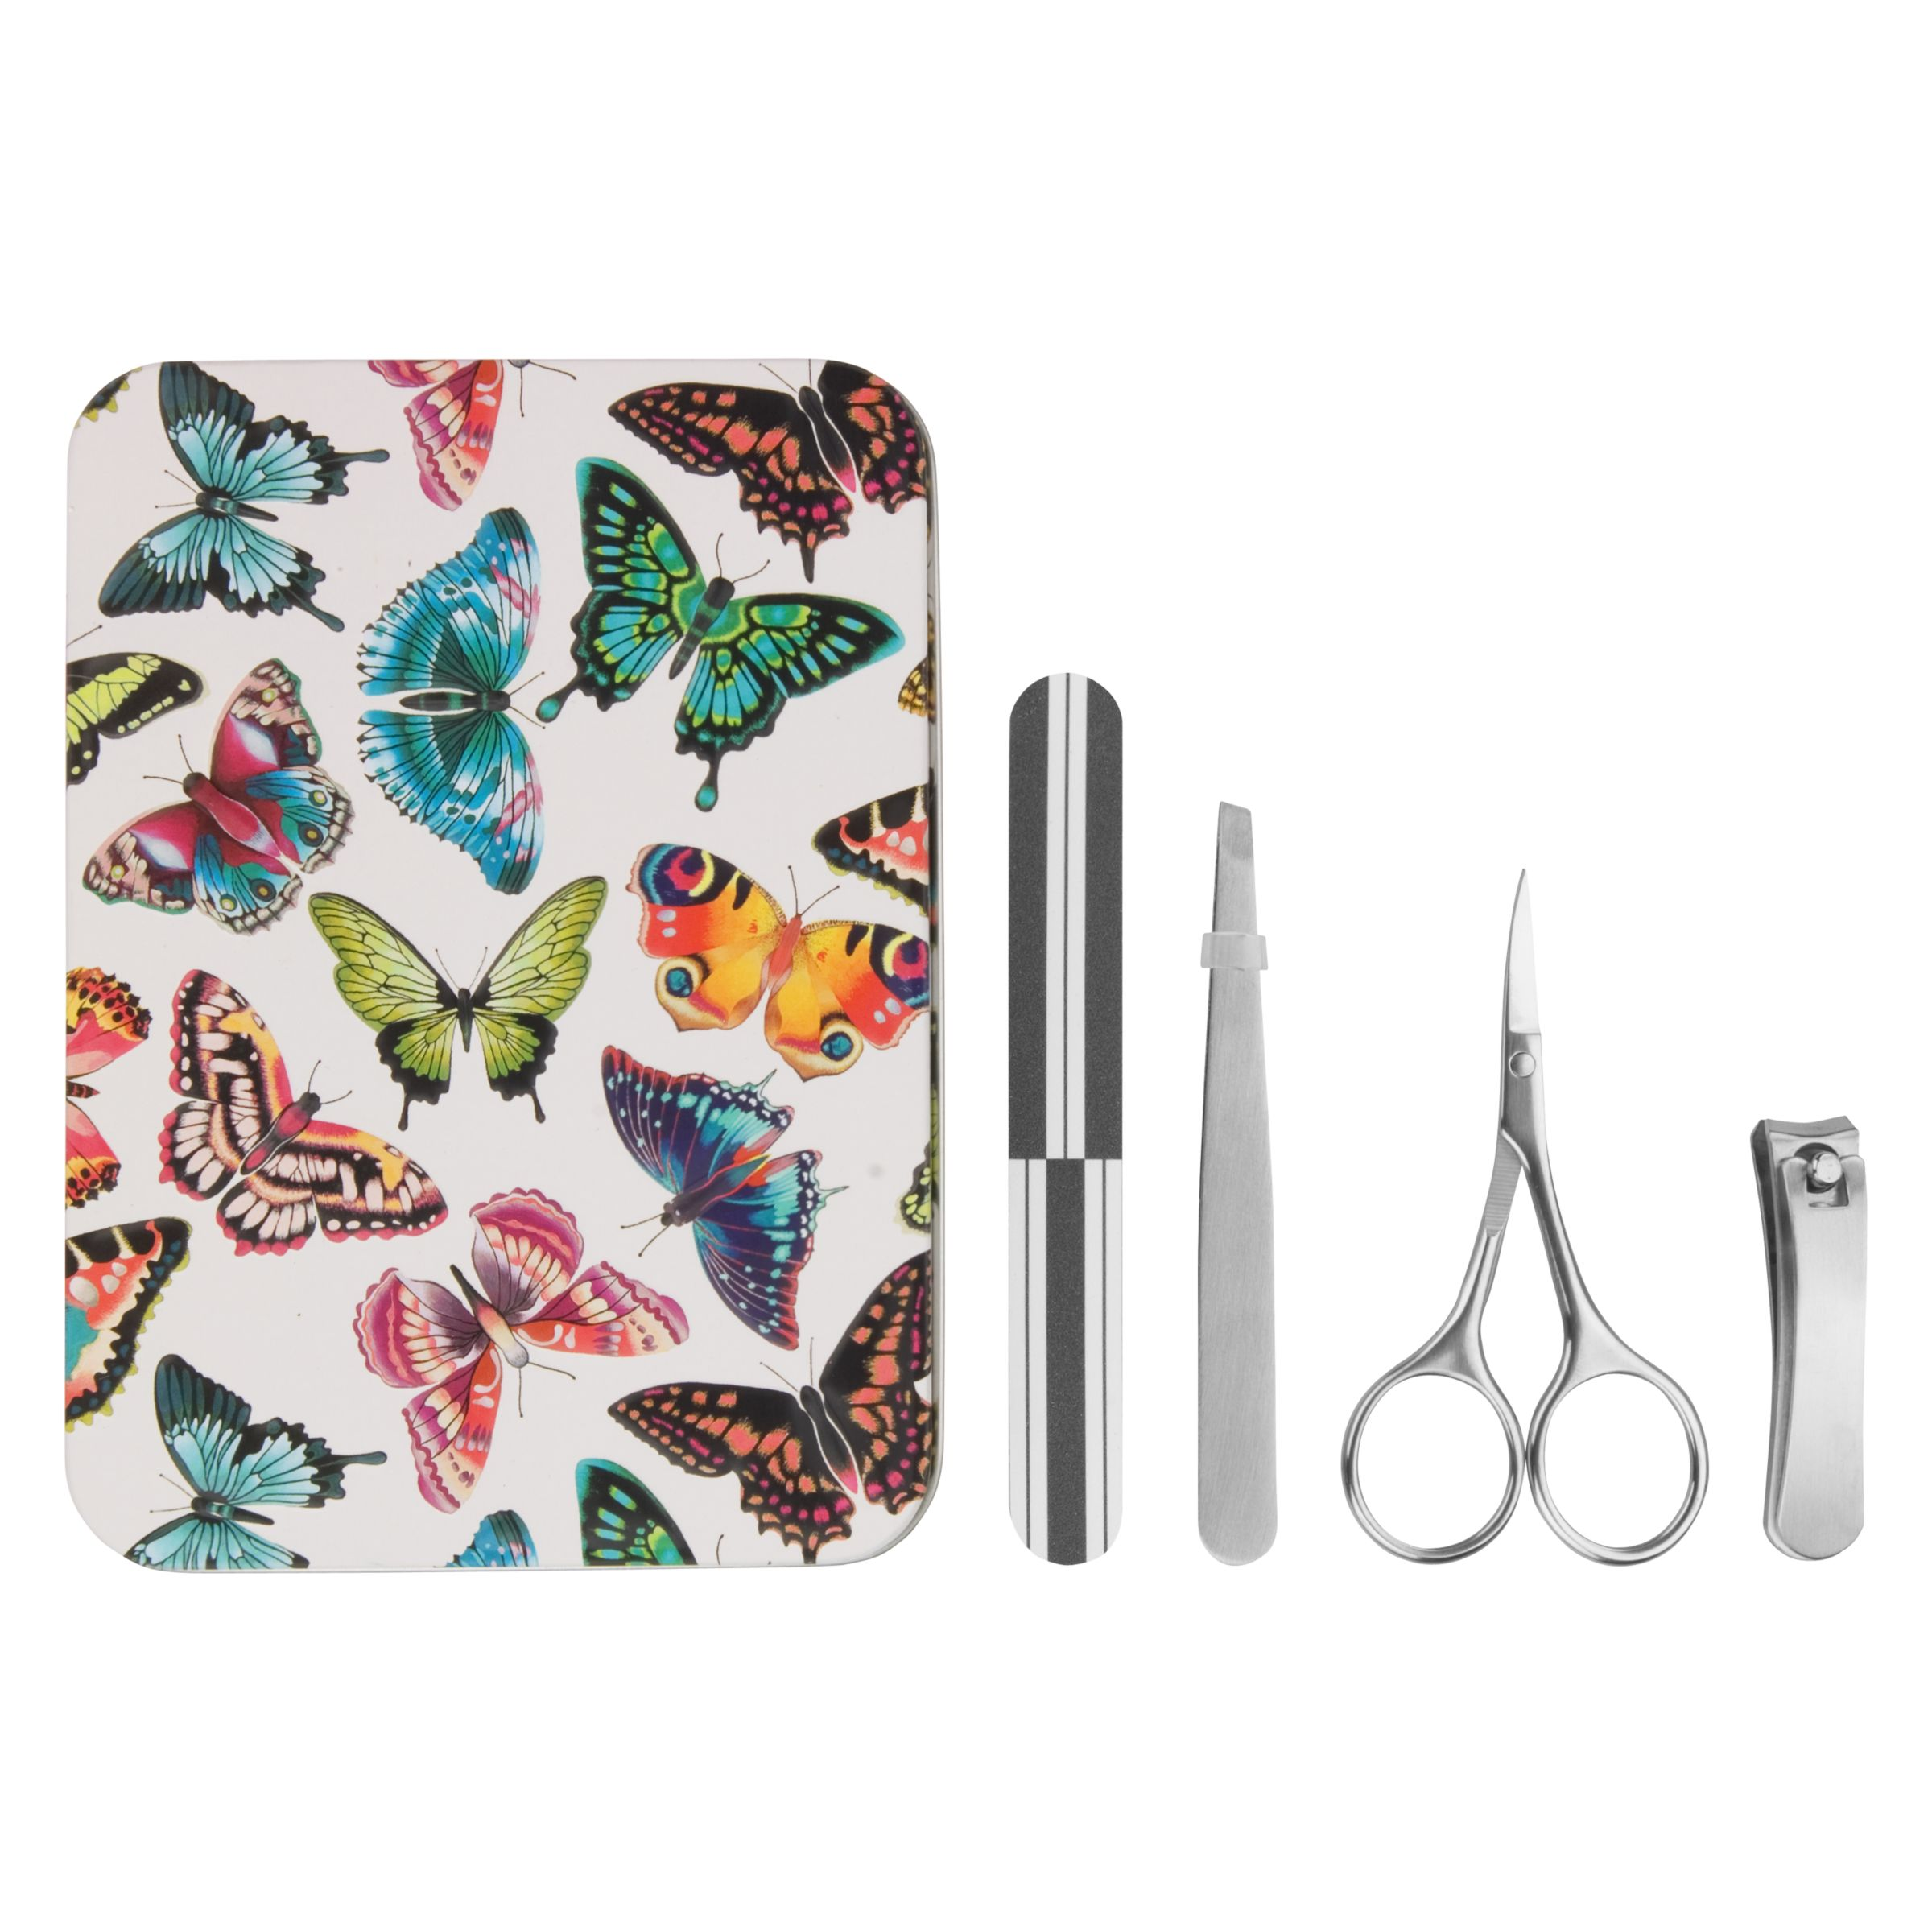 Harlequin Harlequin Papilio Manicure Set